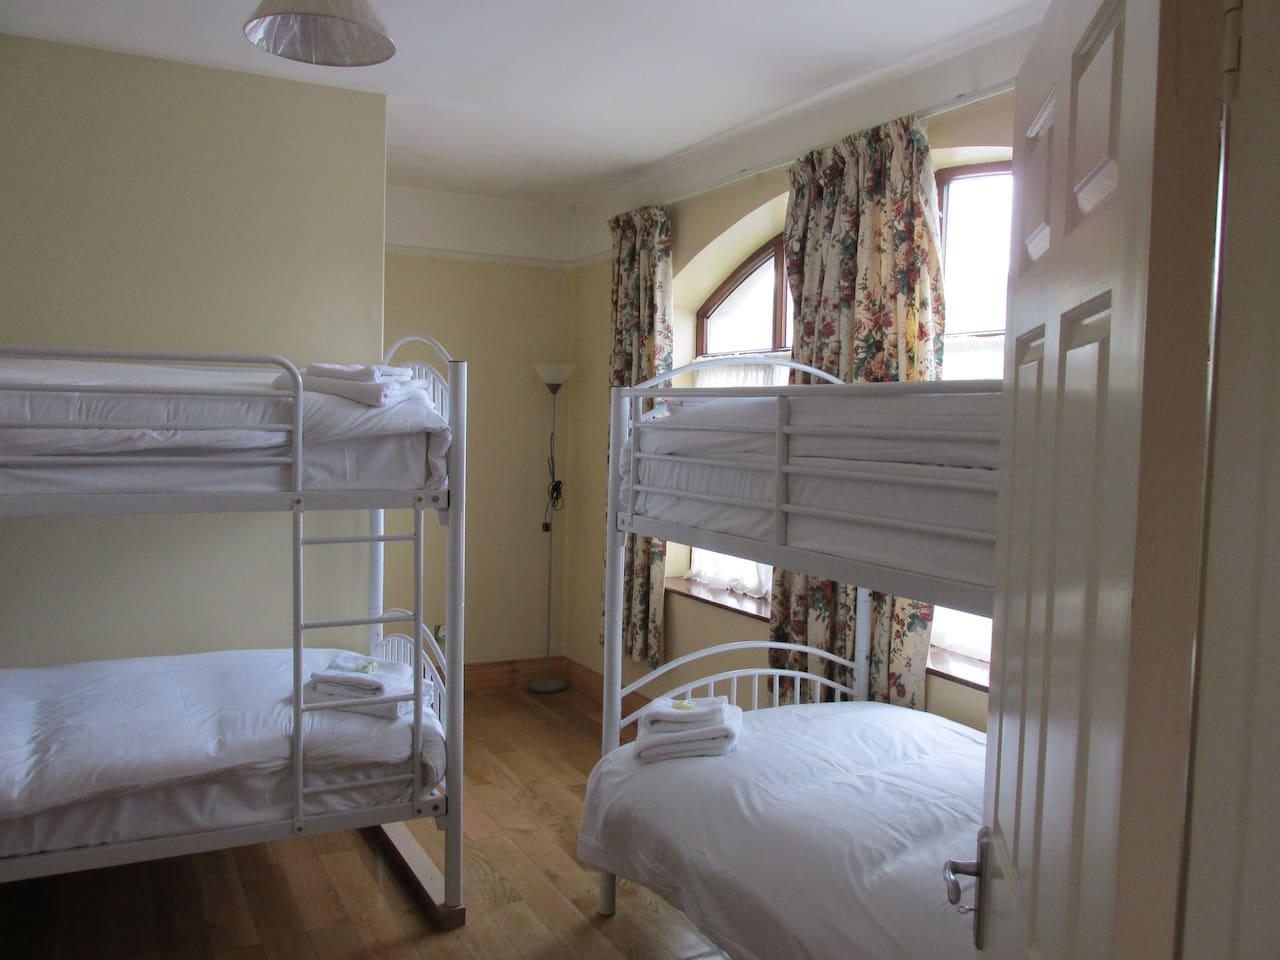 Dorm Room with own bathroom (sleeps 6)